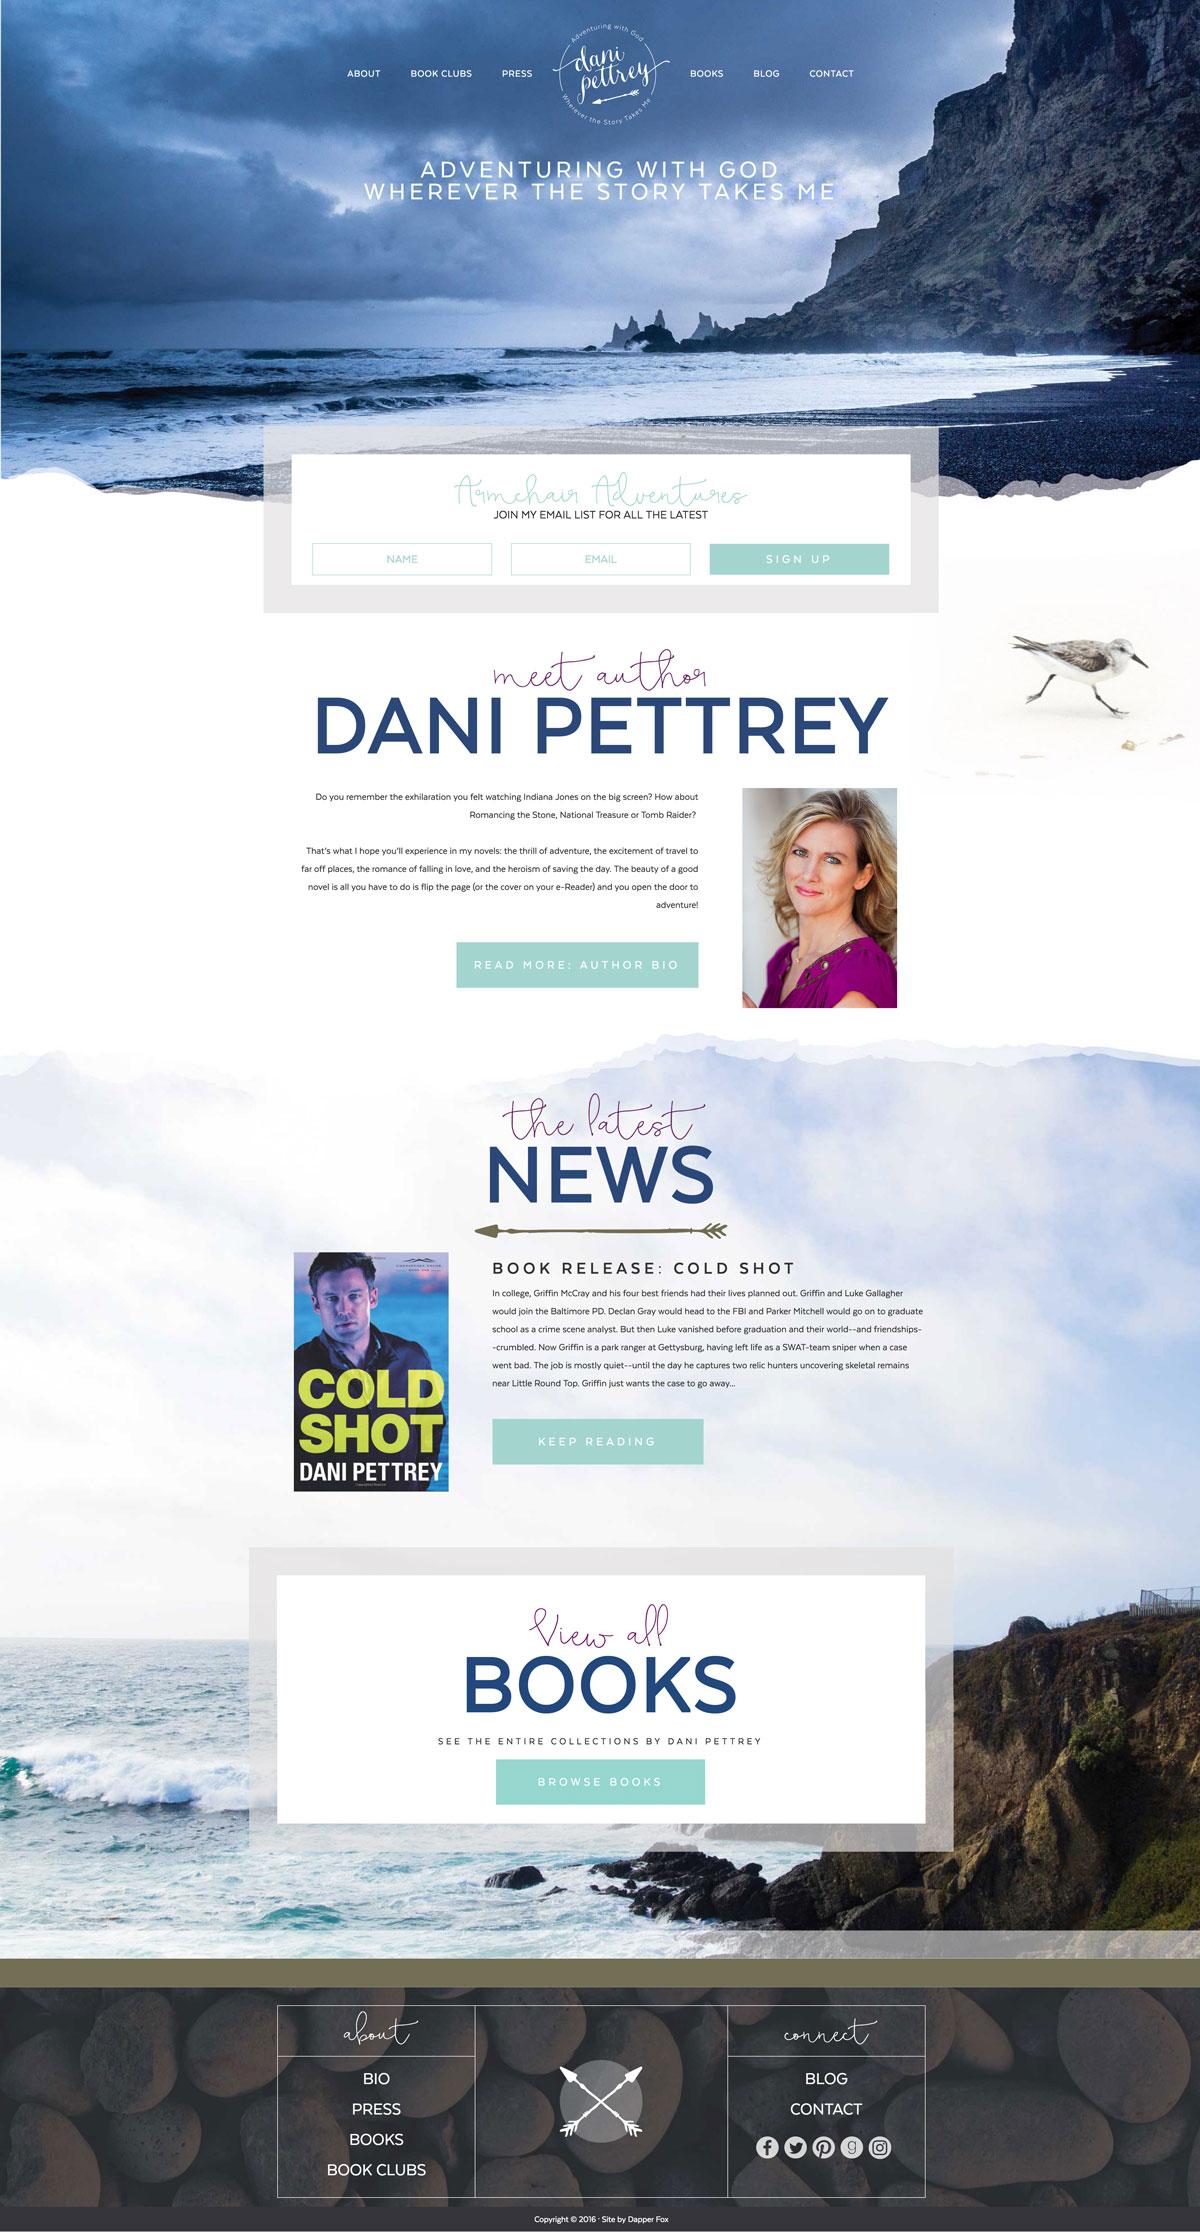 Dani+Pettrey+Wordpress+Website+and+Branding+Design+#Coastal+#Beach+#Ocean+#Design+#Modern.jpeg